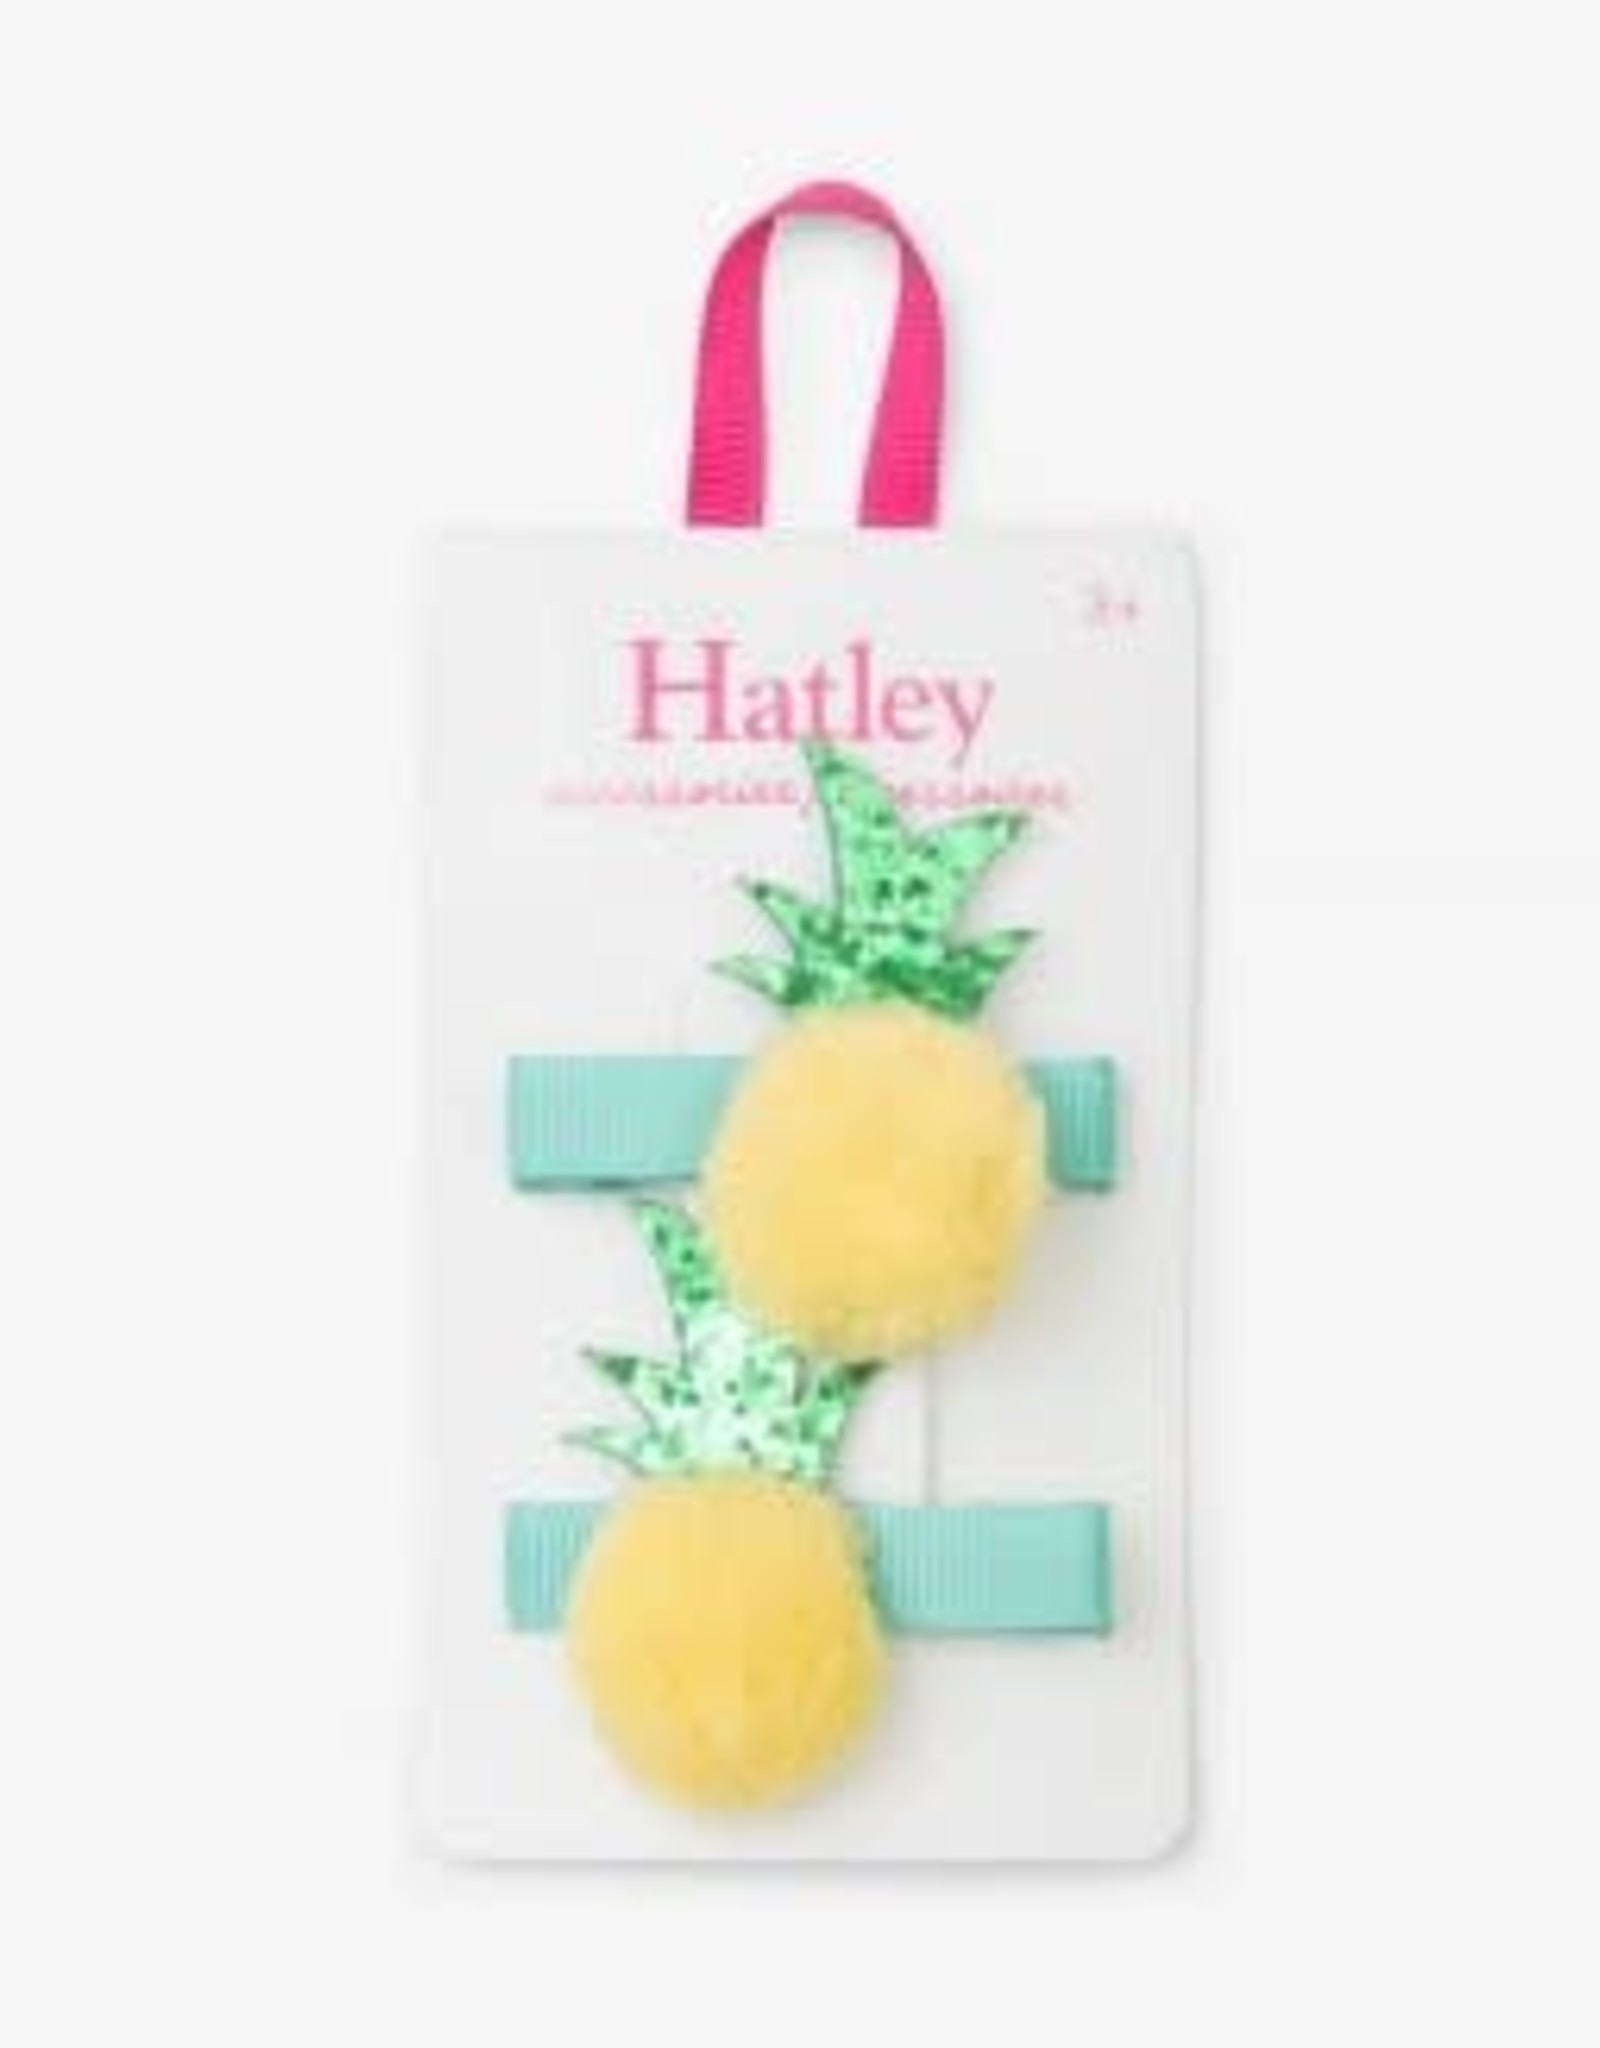 Hatley Pom Pom Pineapples Hair Clips (set of 2)